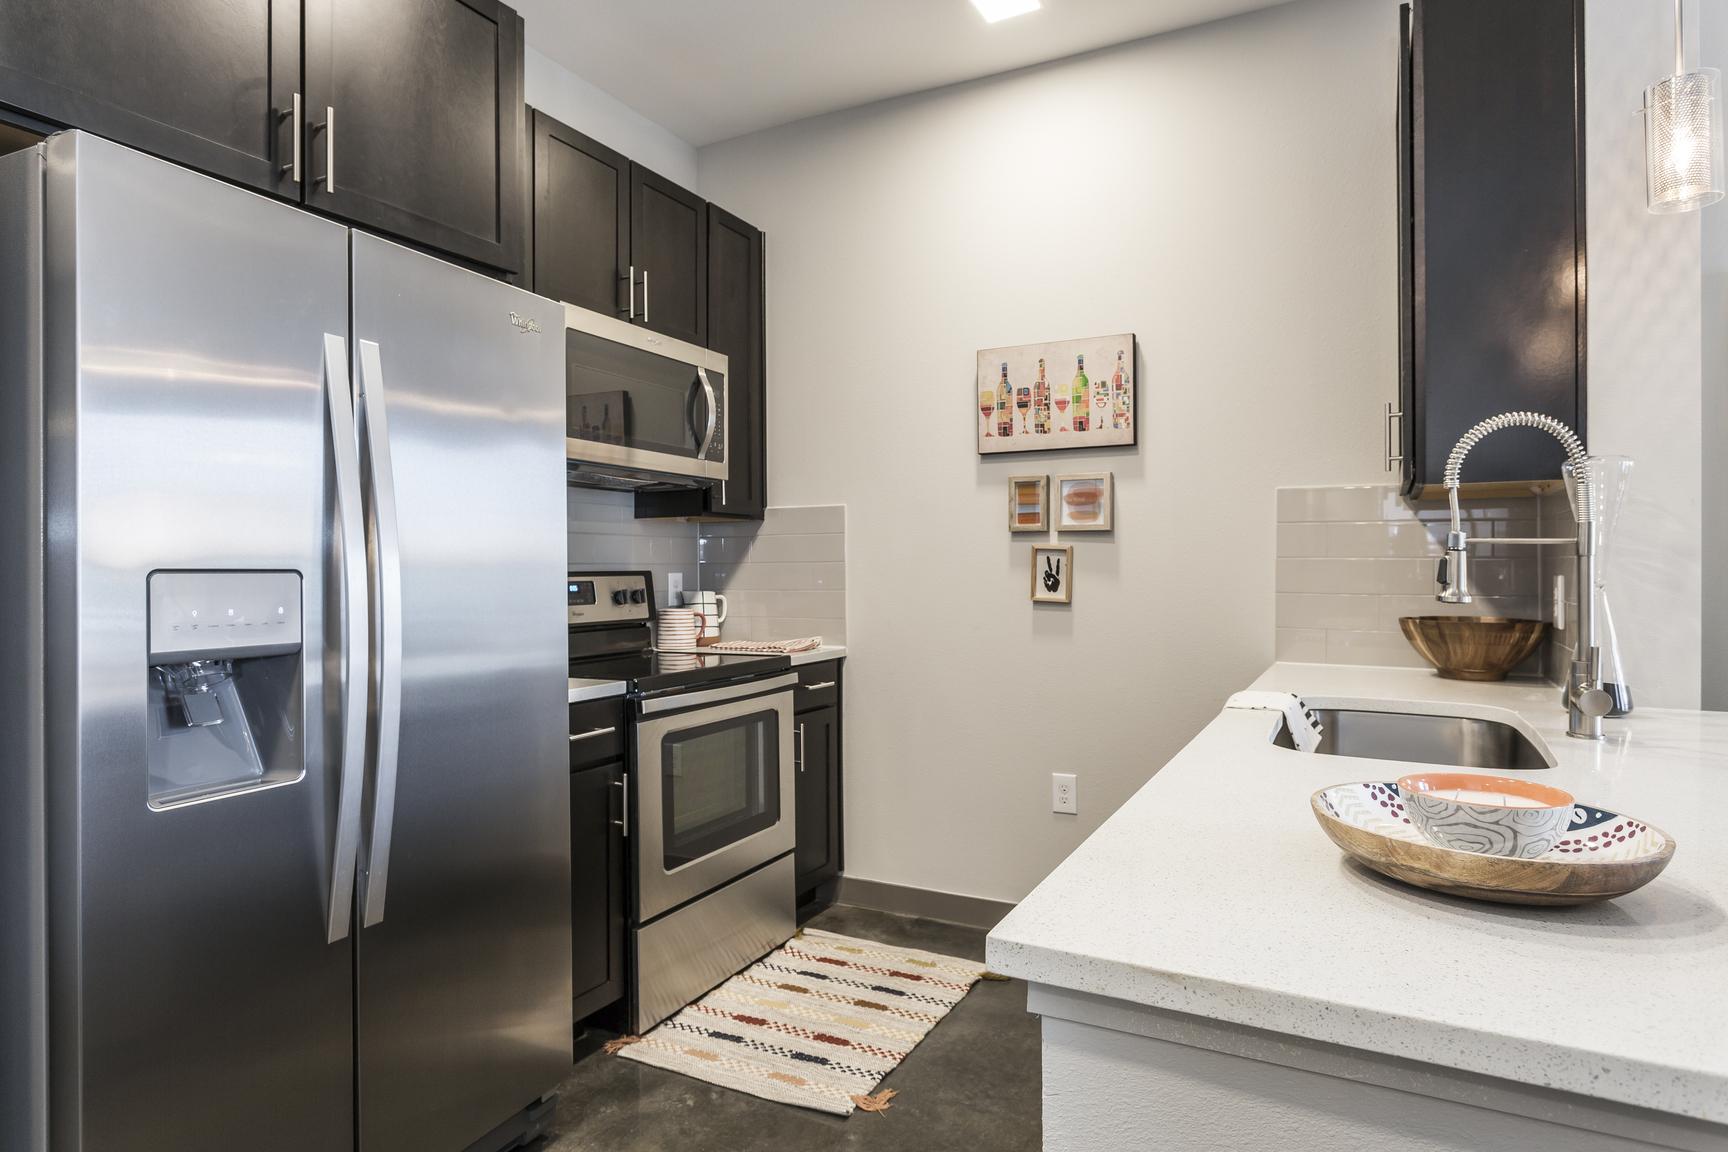 Azure Houston Apartments for rent